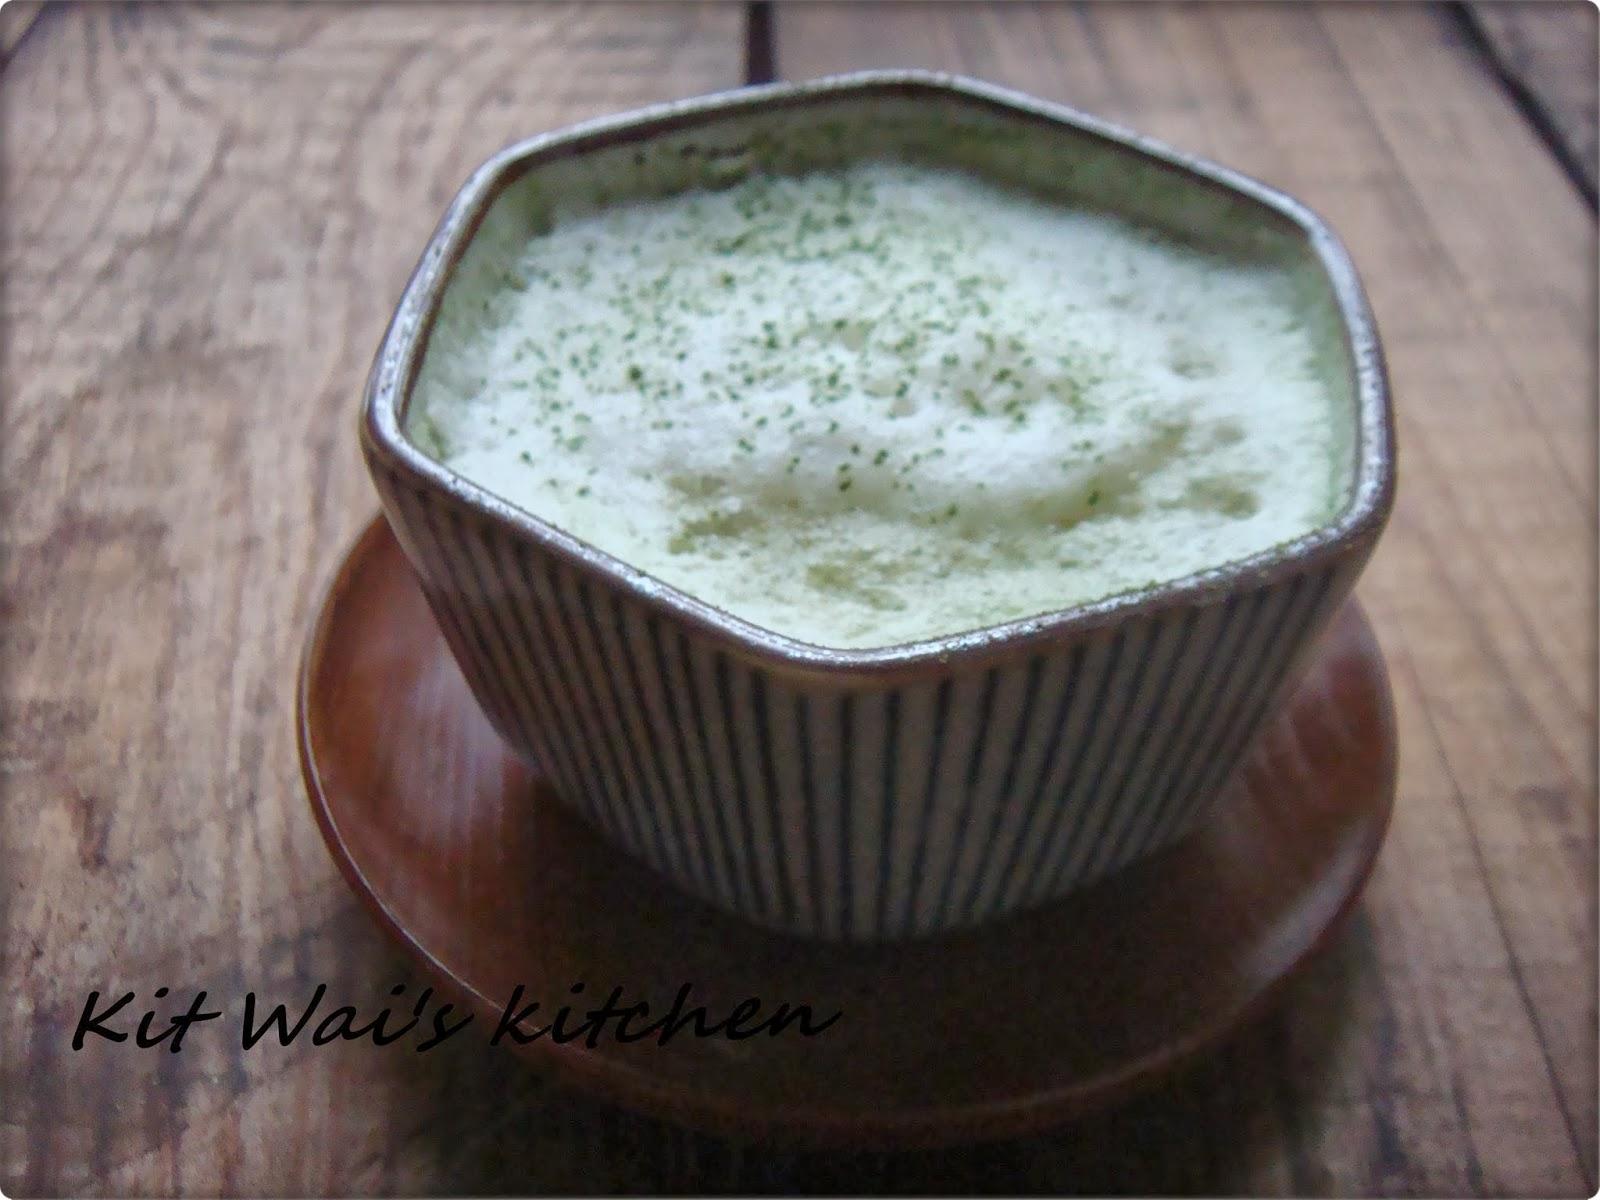 Kit Wai\'s kitchen : 抹茶拿铁~ Green Tea latte